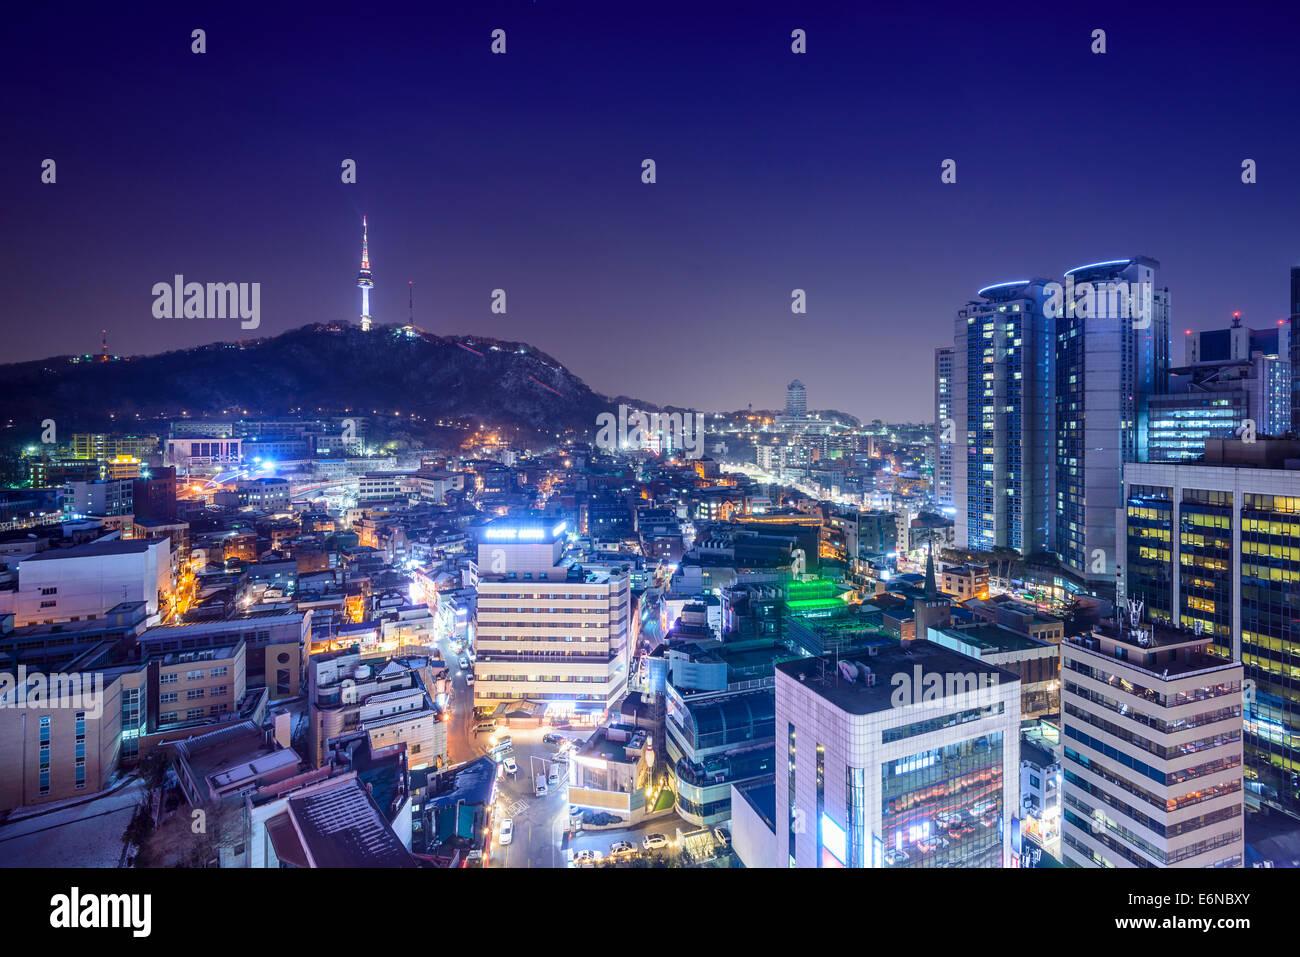 Seoul, South Korea skyline at night. - Stock Image